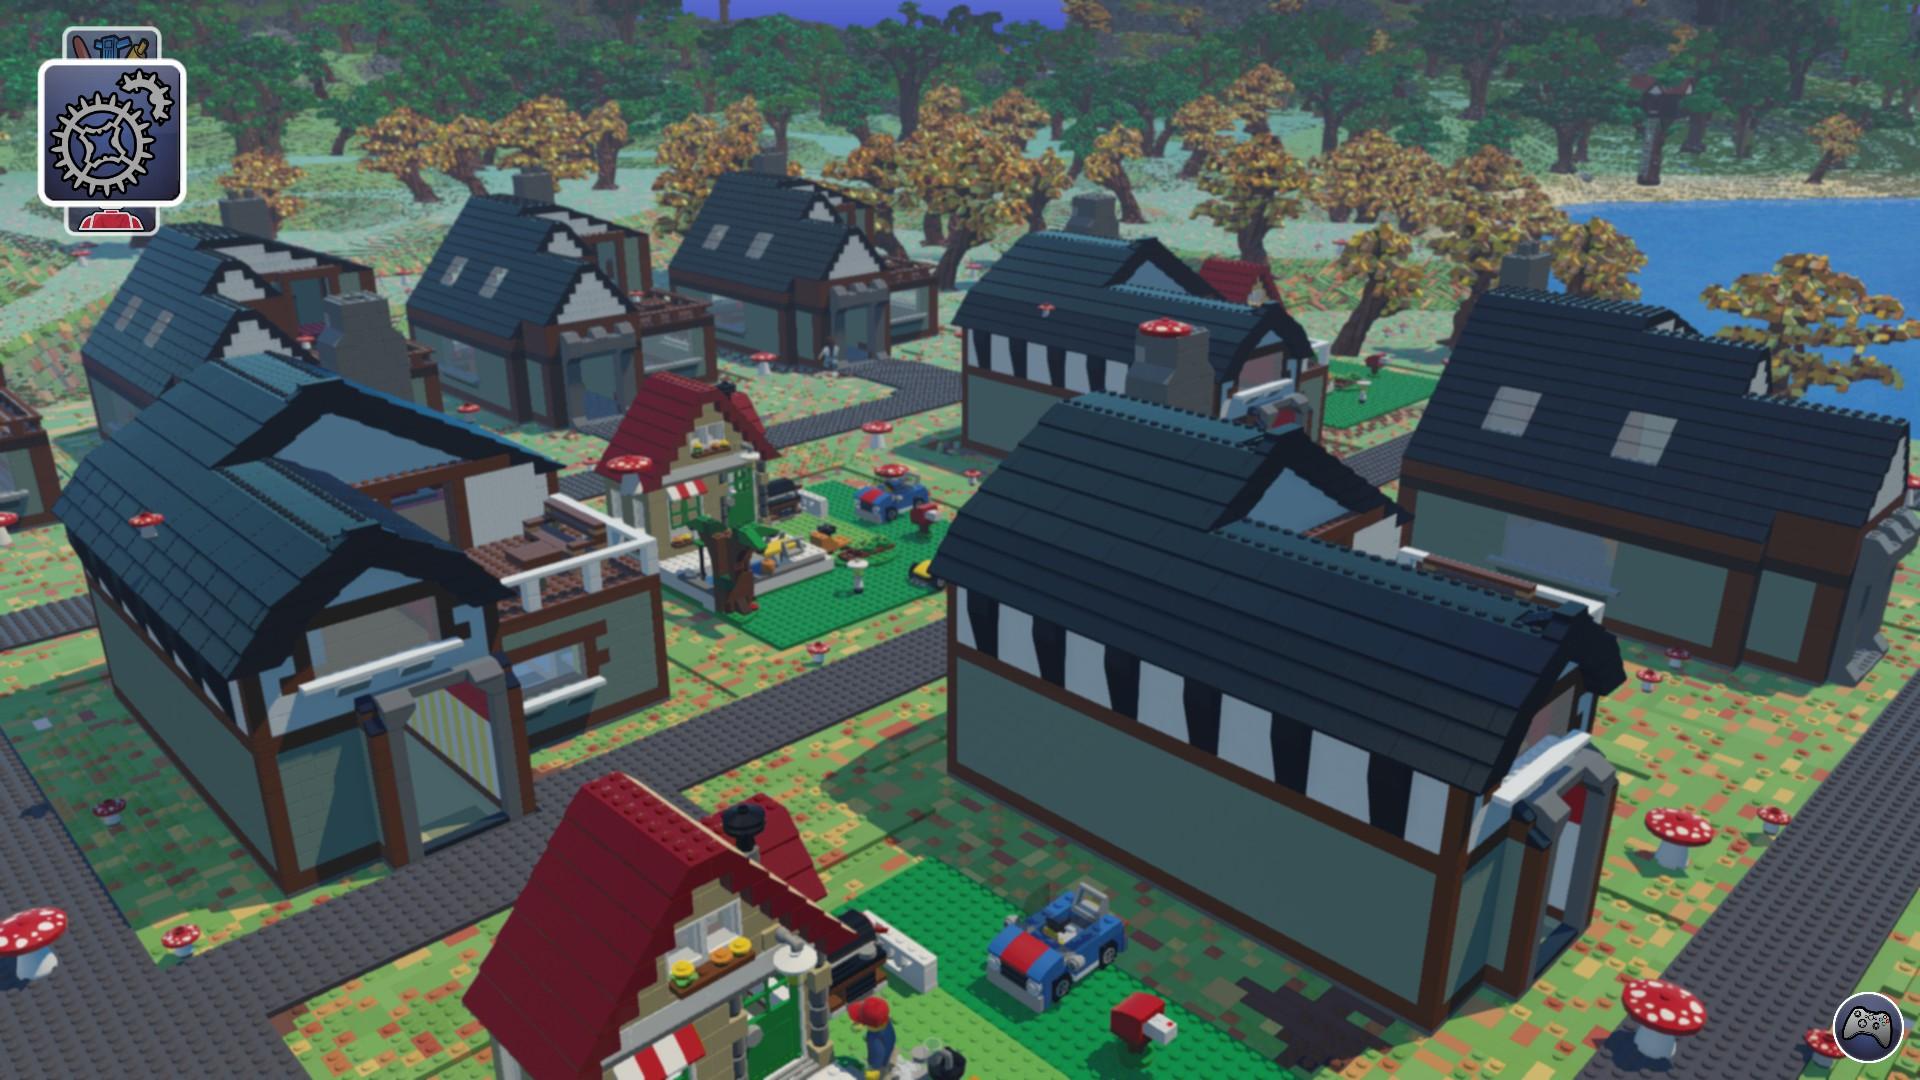 LEGO_Worlds_screenshot_08